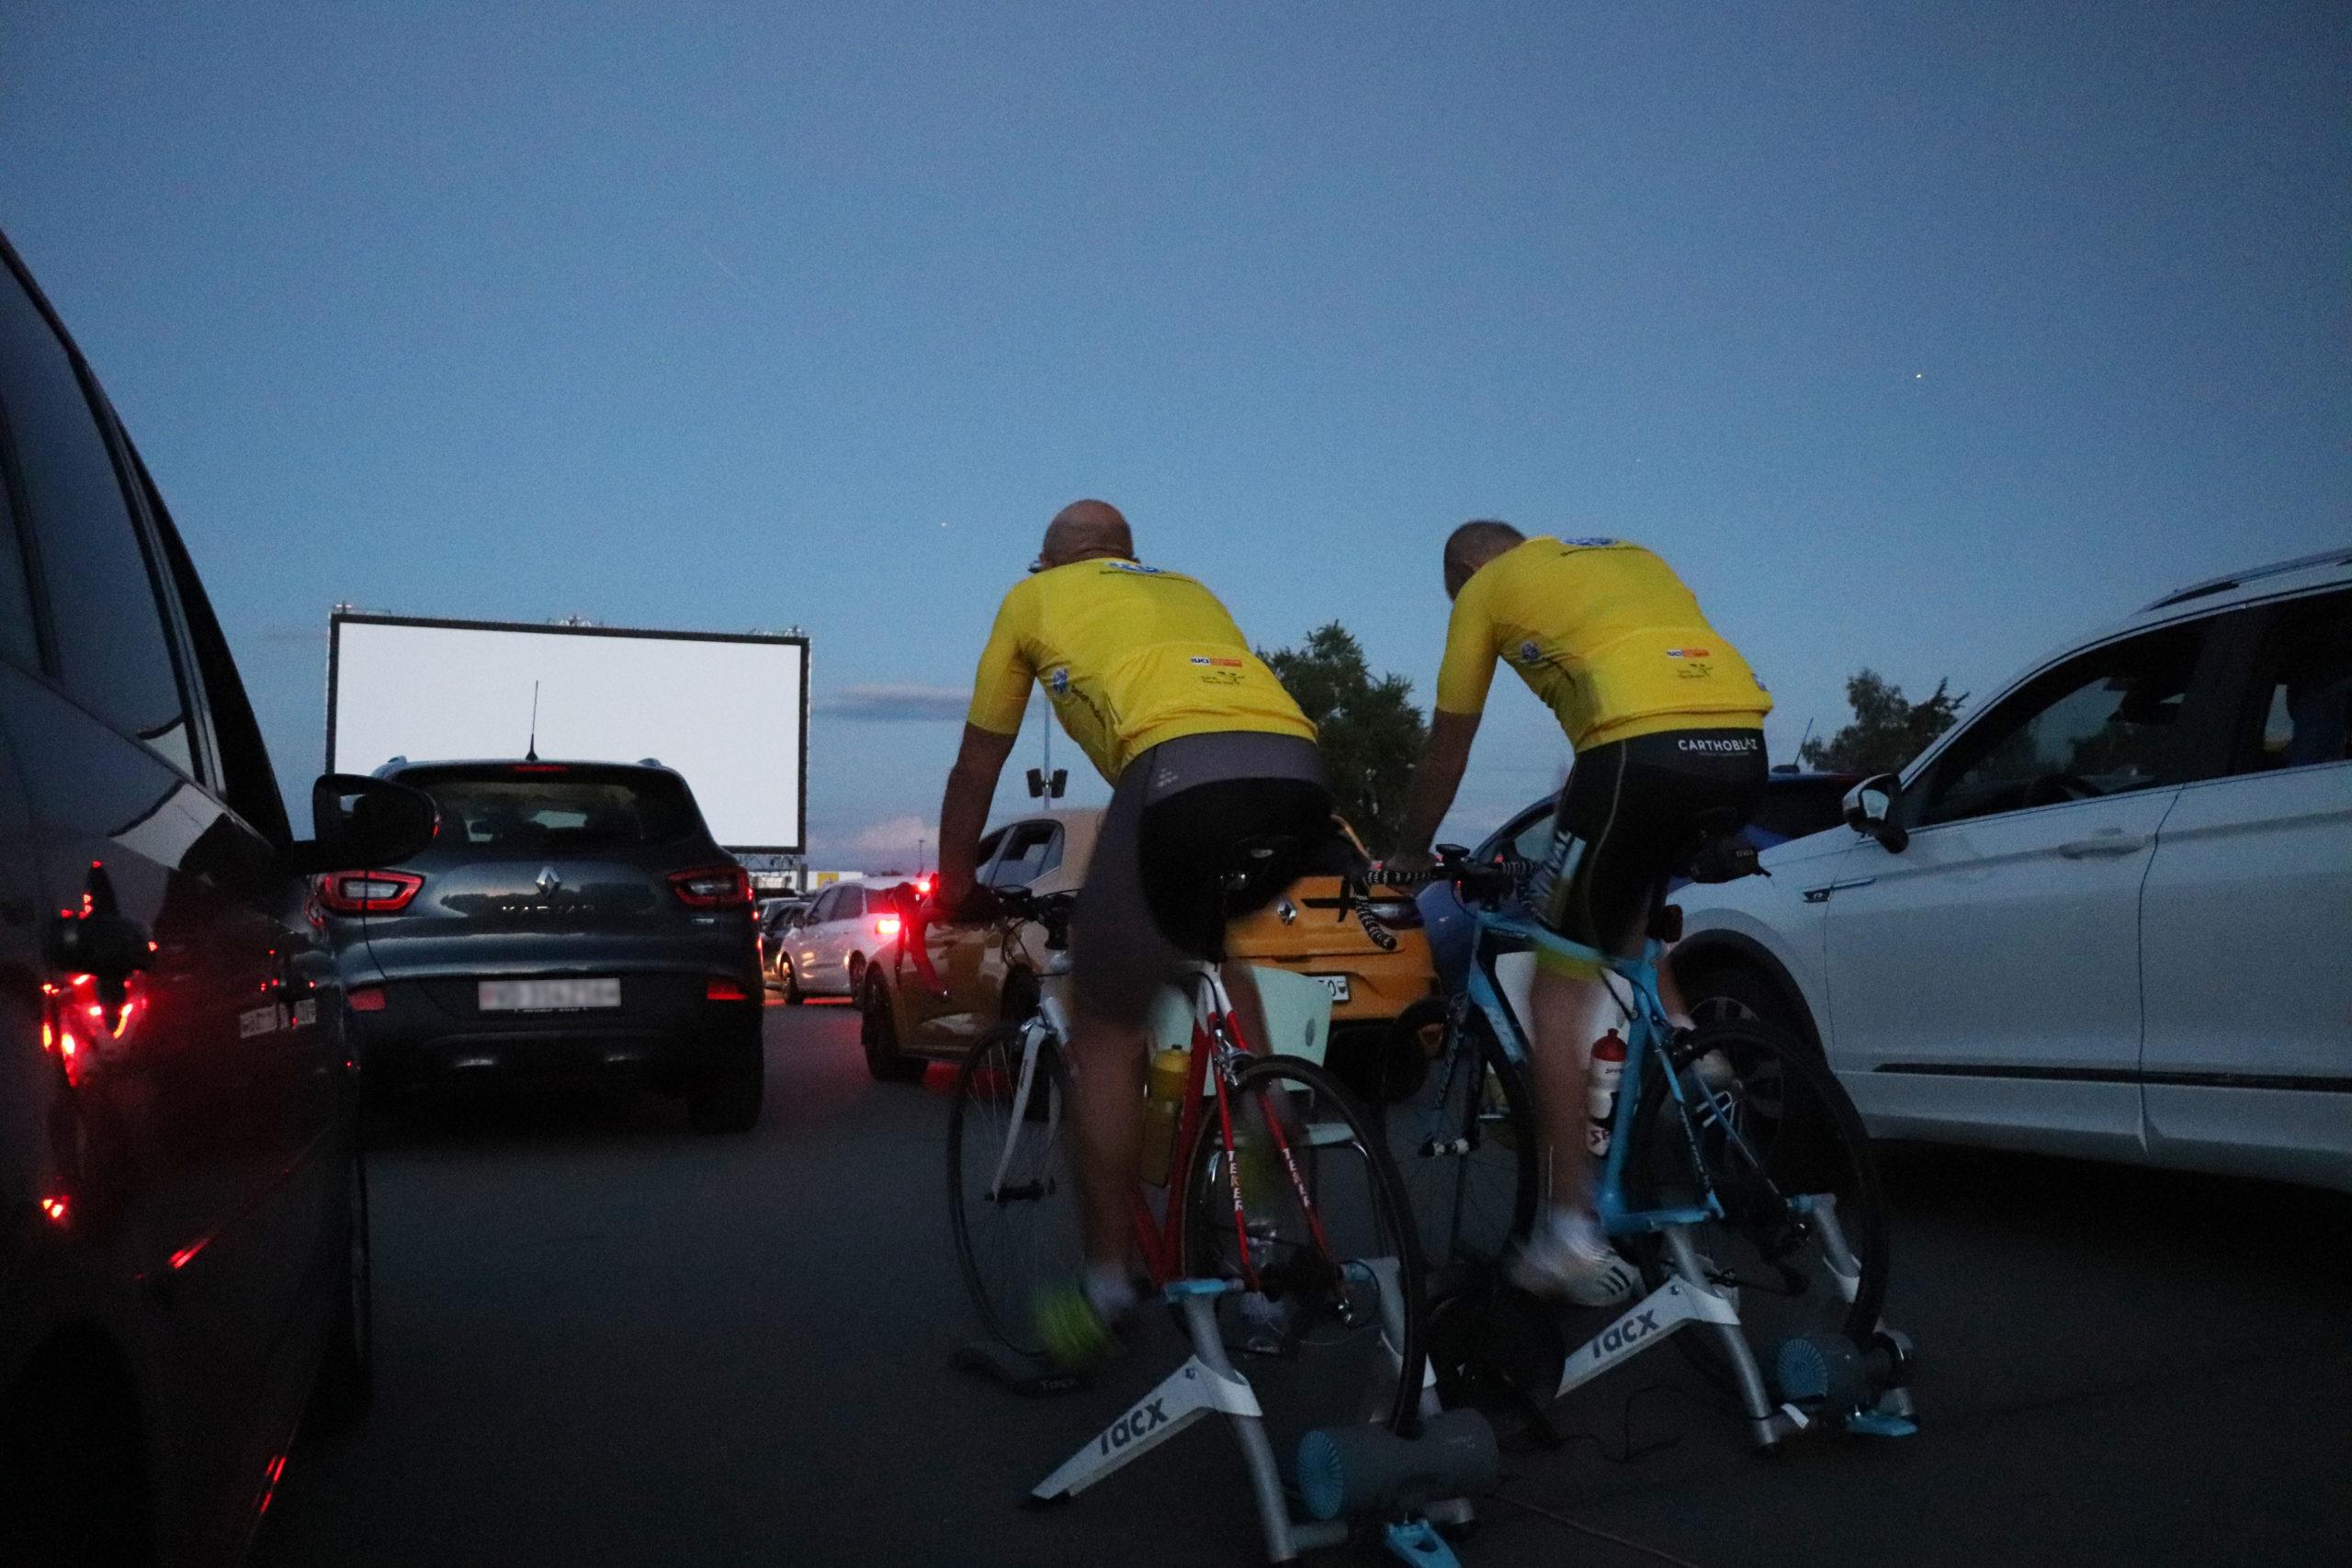 Cossonay: Le Drive-in à vélo